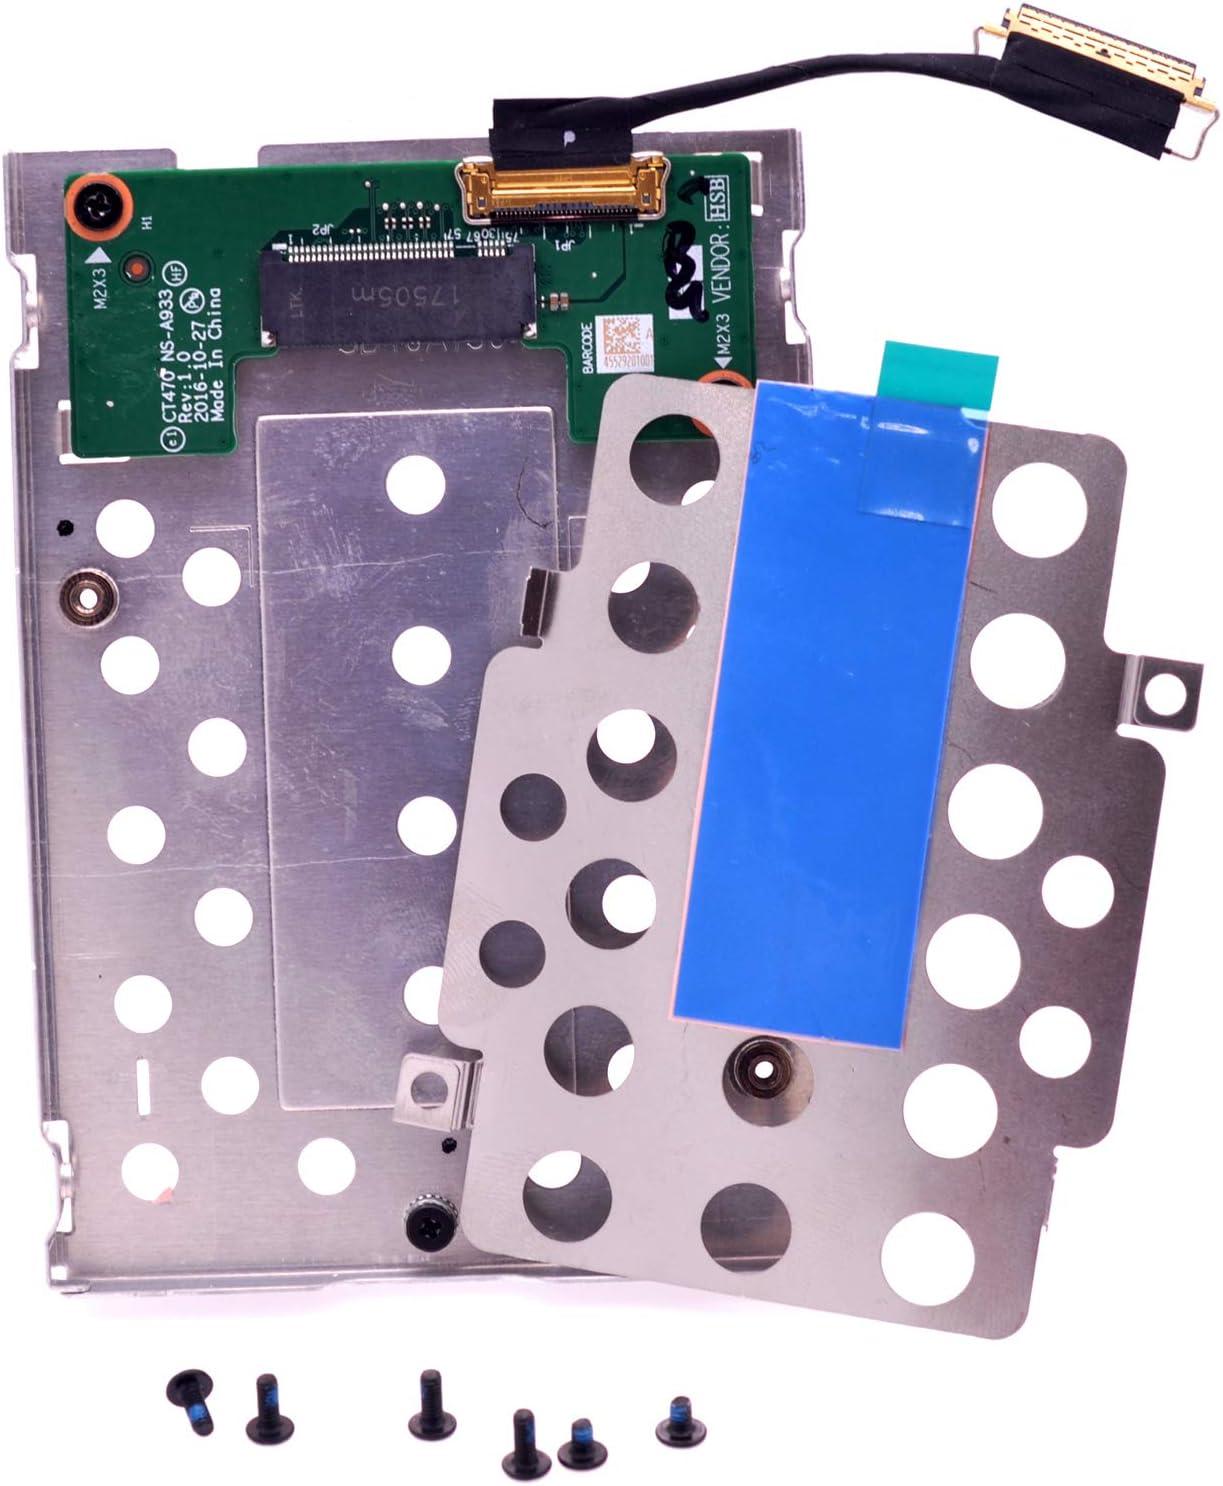 Deal4GO PCIe SSD NVME M.2 Nashville-Davidson Mall to Drive Hard Caddy Brack Very popular Adapter 2.5